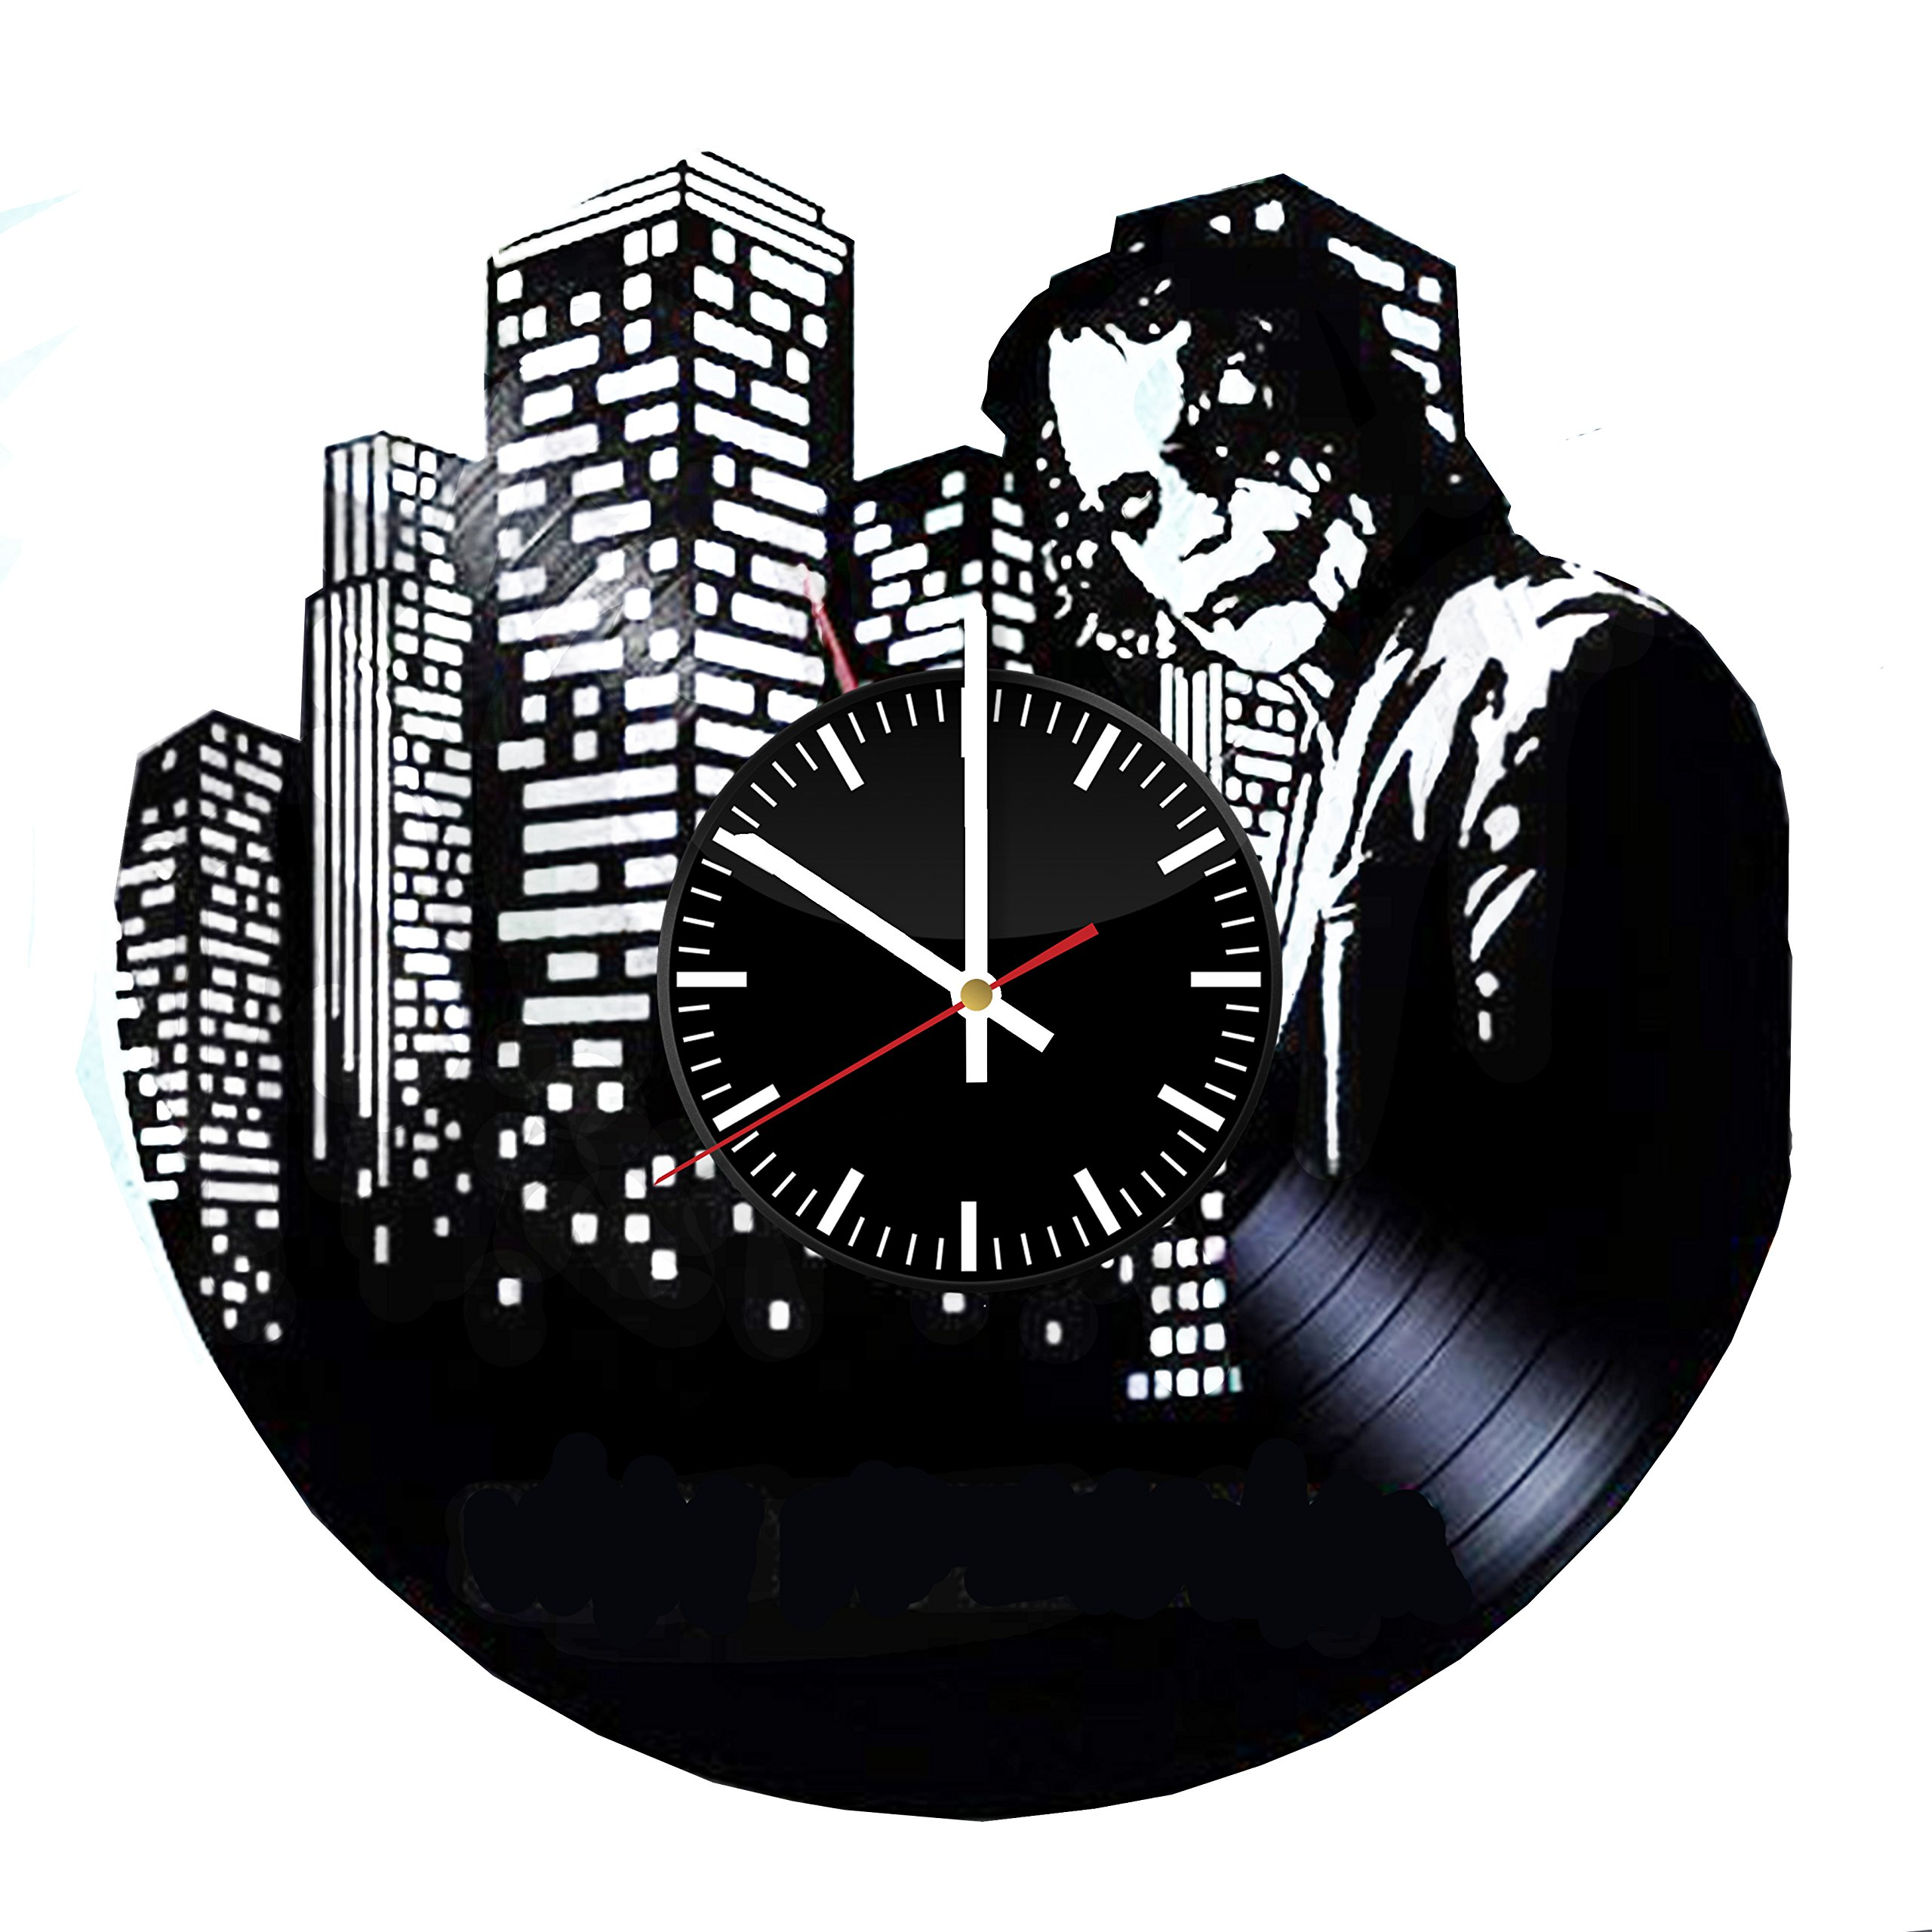 Welcome Everyday Arts Dark Knight Joker Vinyl Record Wall Clock - Get unique home room wall decor - Gift ideas for parents, siblings, teens – DC Comics Unique Design